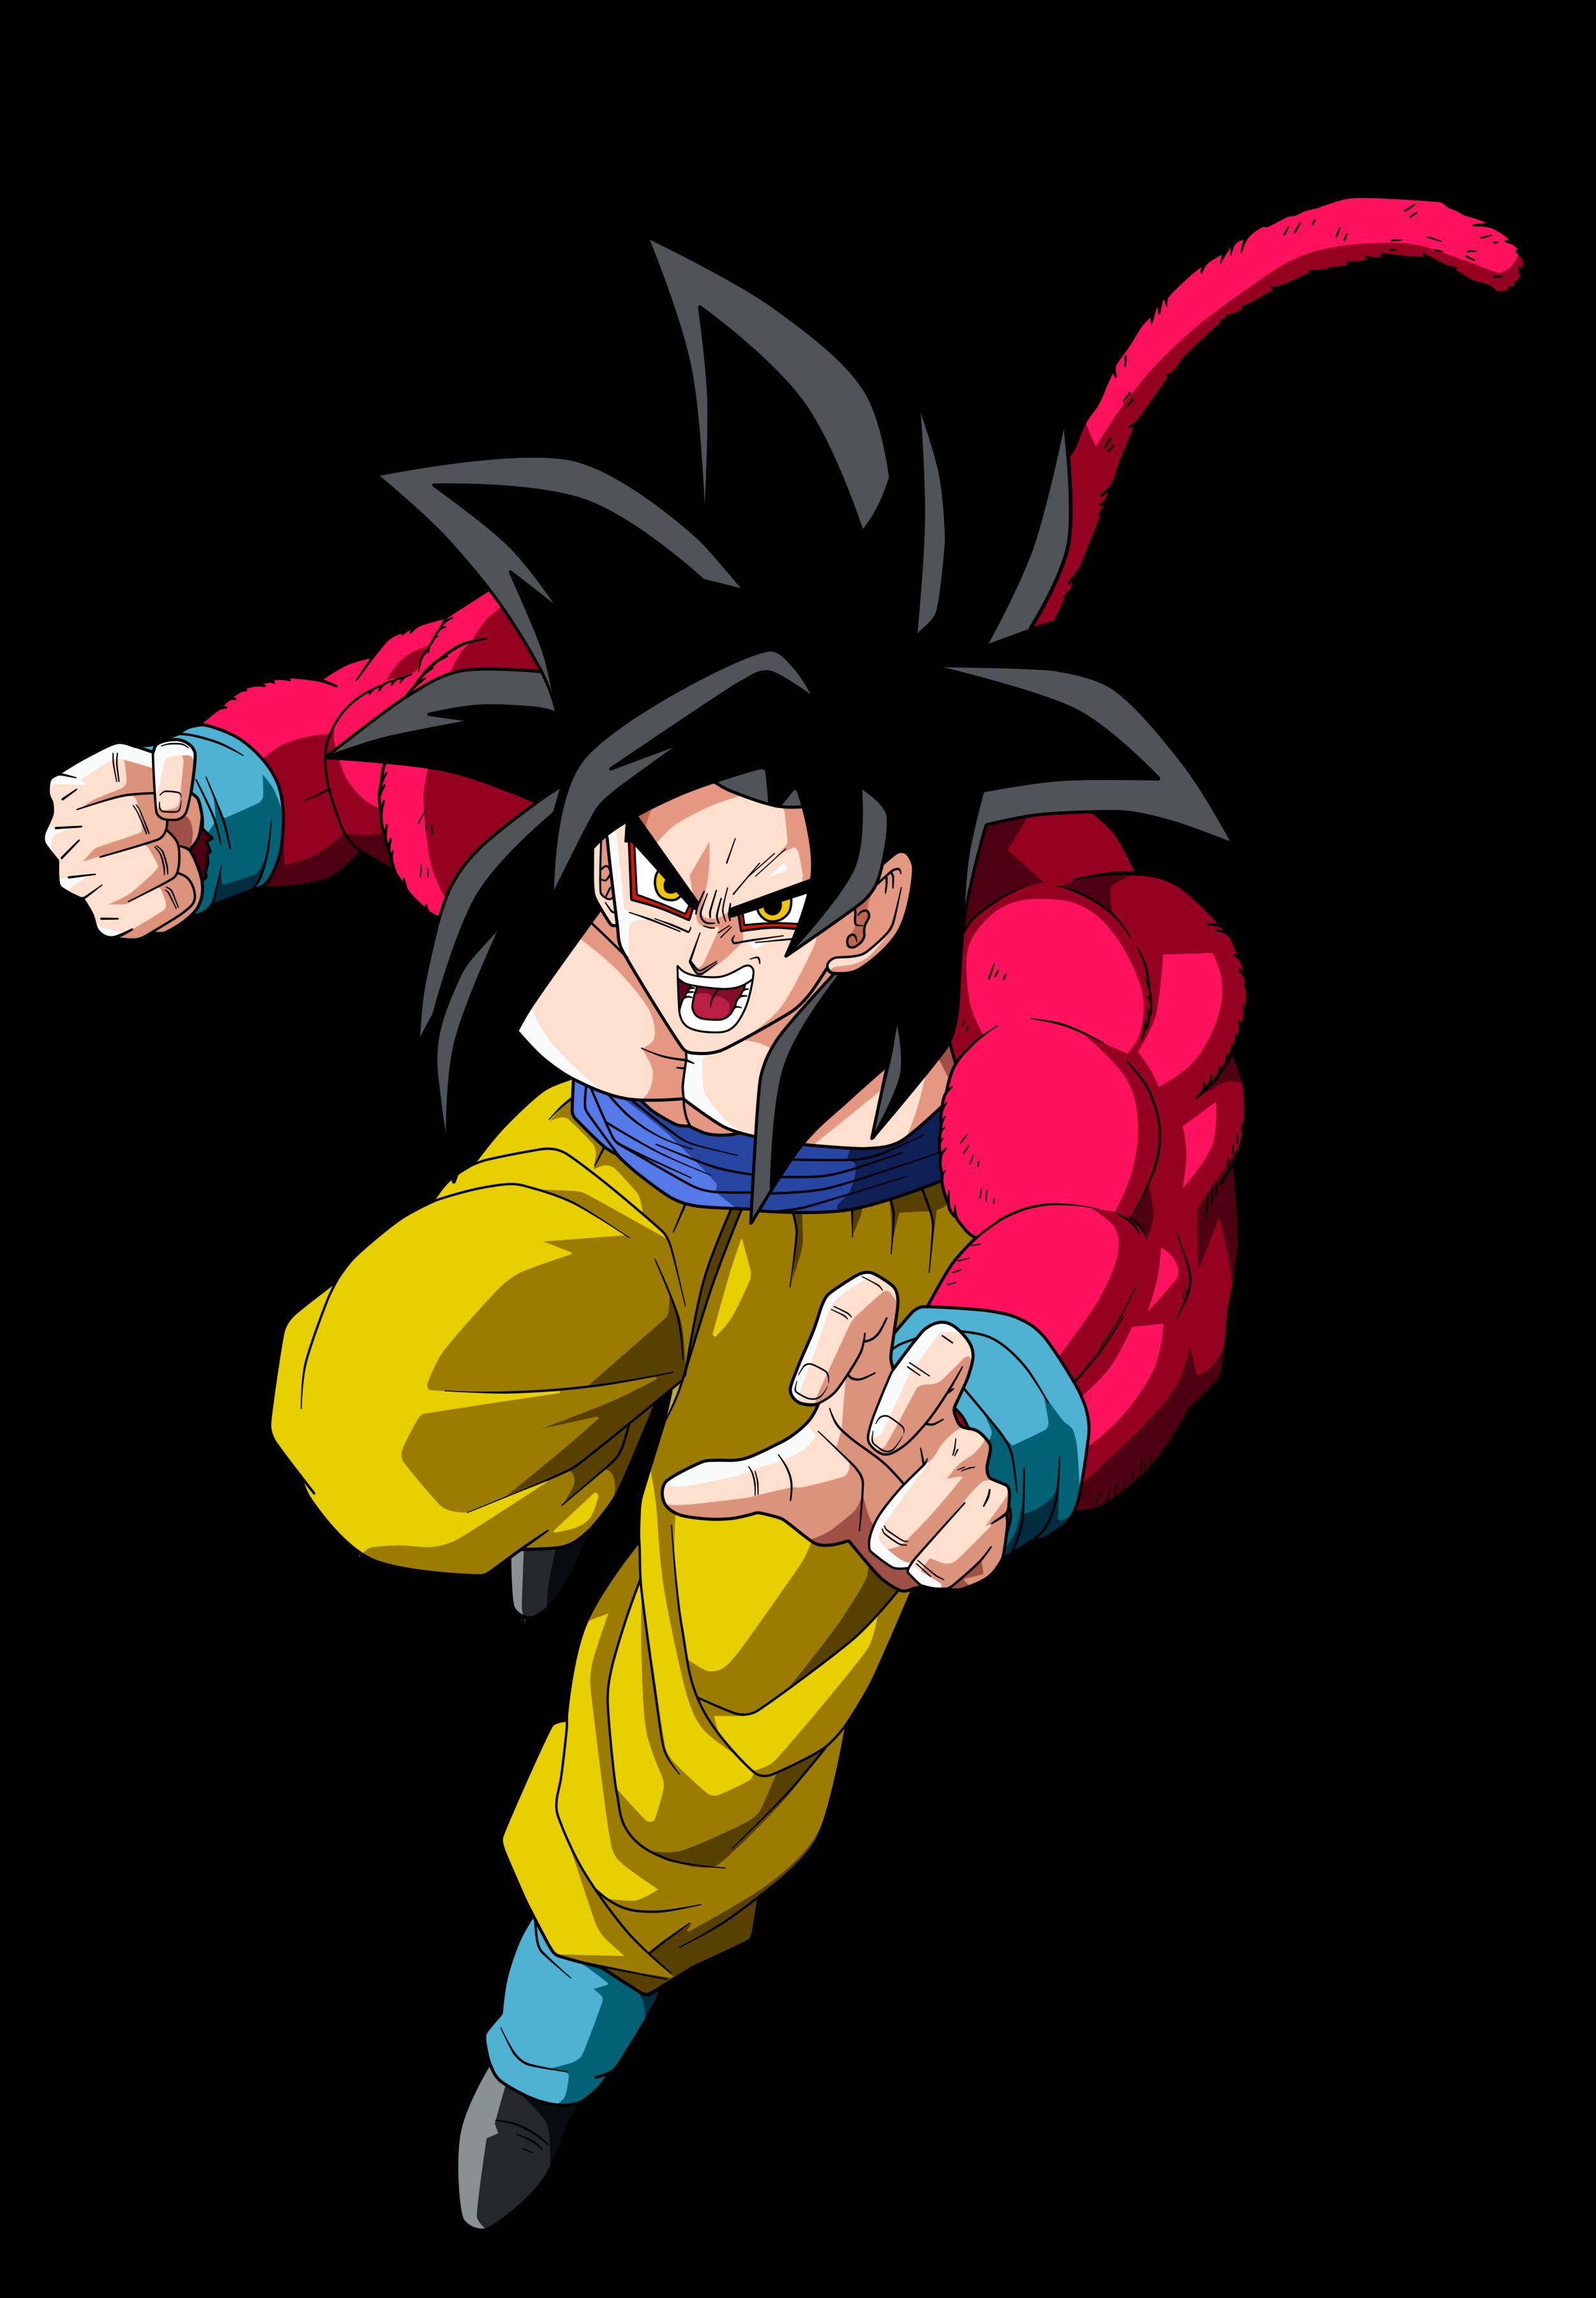 Si te gusta Goku, Este es tu post!